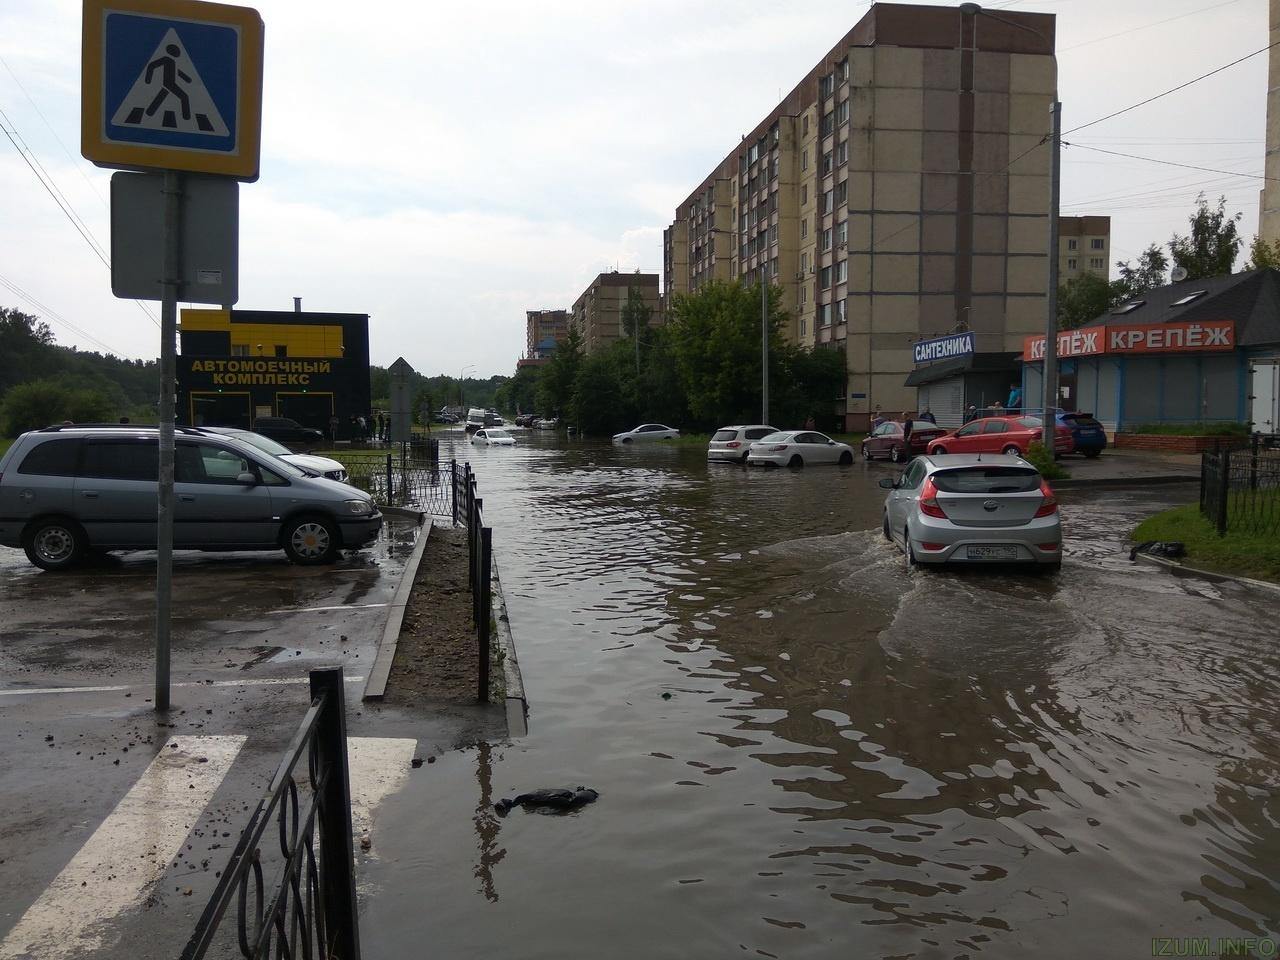 Лифень в Красногорске и холмах 30.06.17 (2).jpg